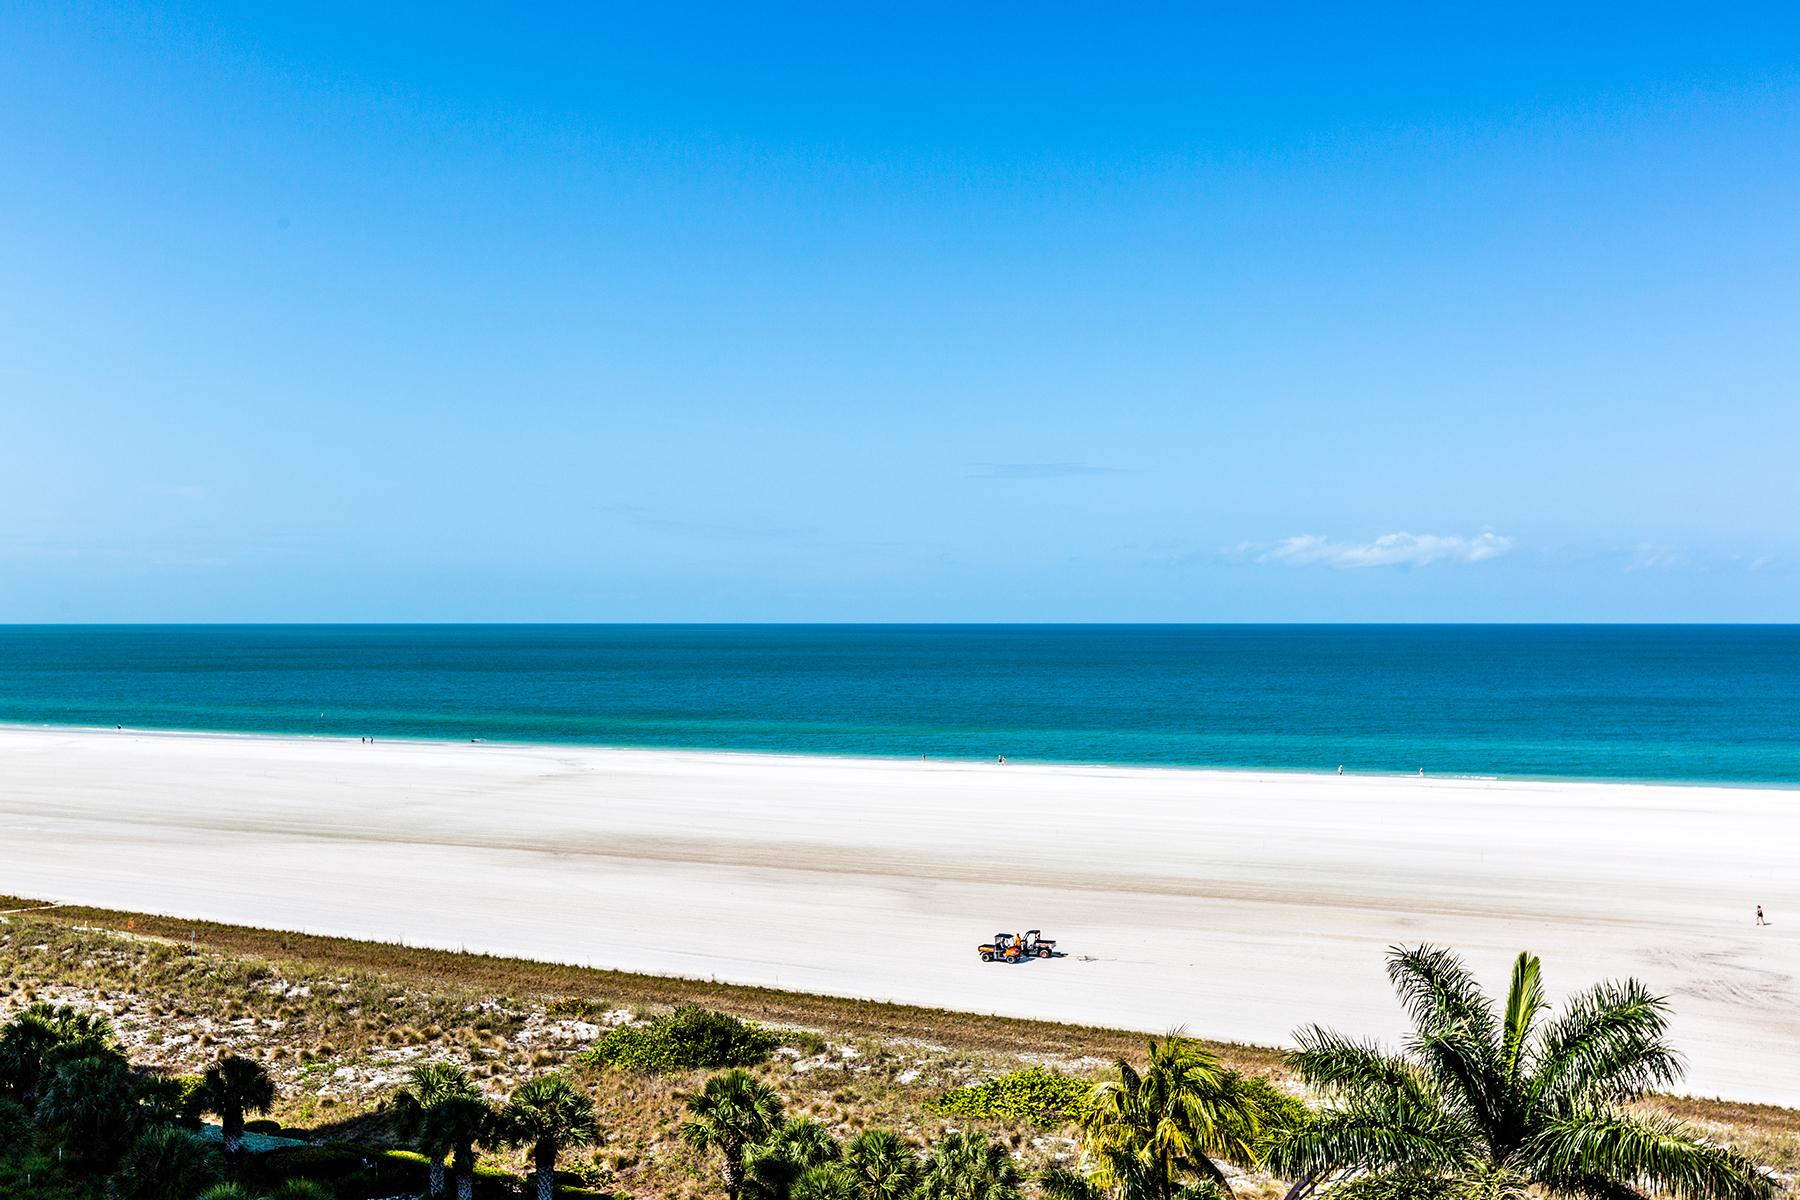 共管物業 為 出售 在 MARCO ISLAND - ADMIRALTY HOUSE 140 Seaview Ct 906S Marco Island, 佛羅里達州, 34145 美國